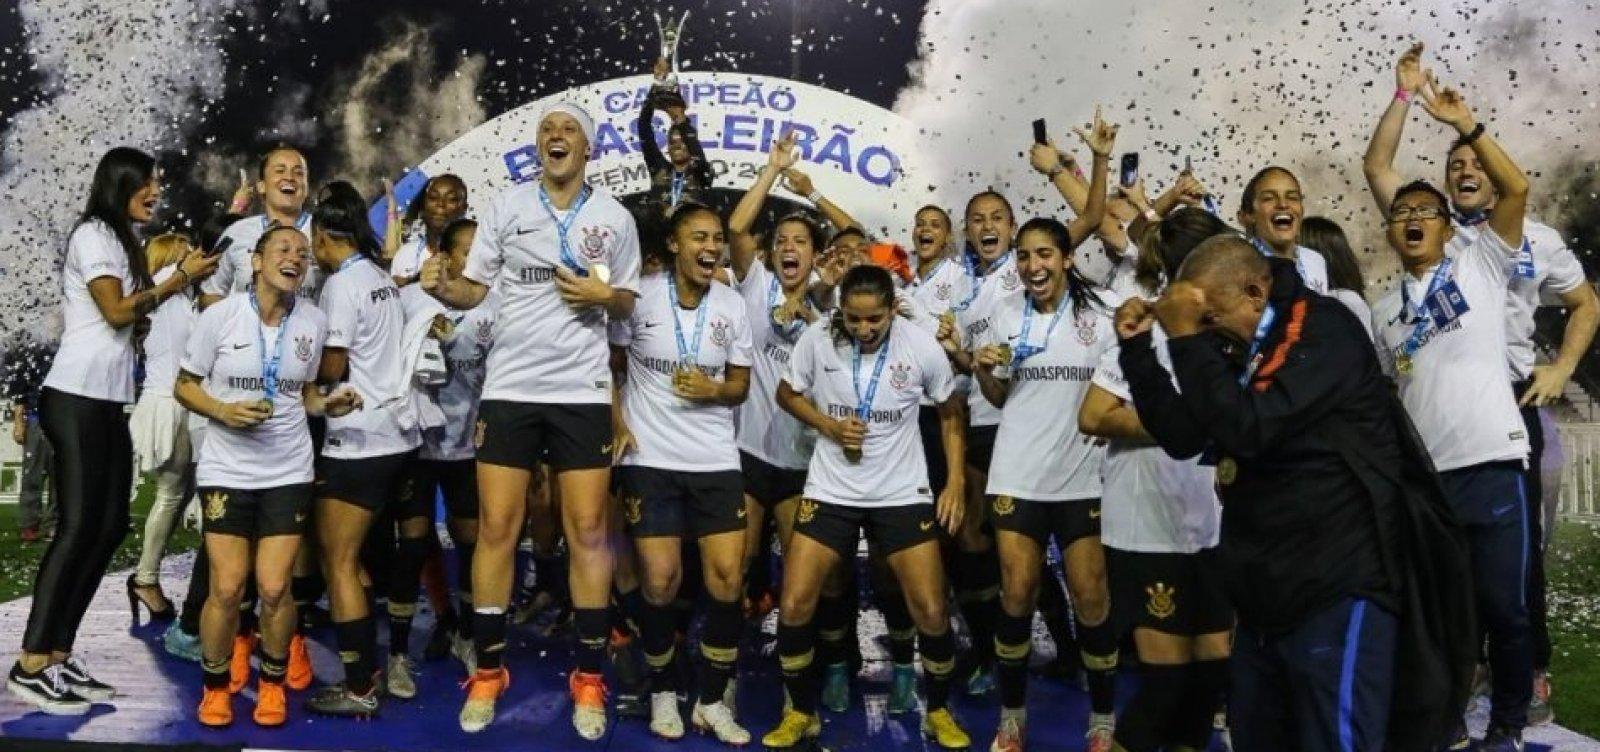 Band vai exibir Campeonato Brasileiro de futebol feminino